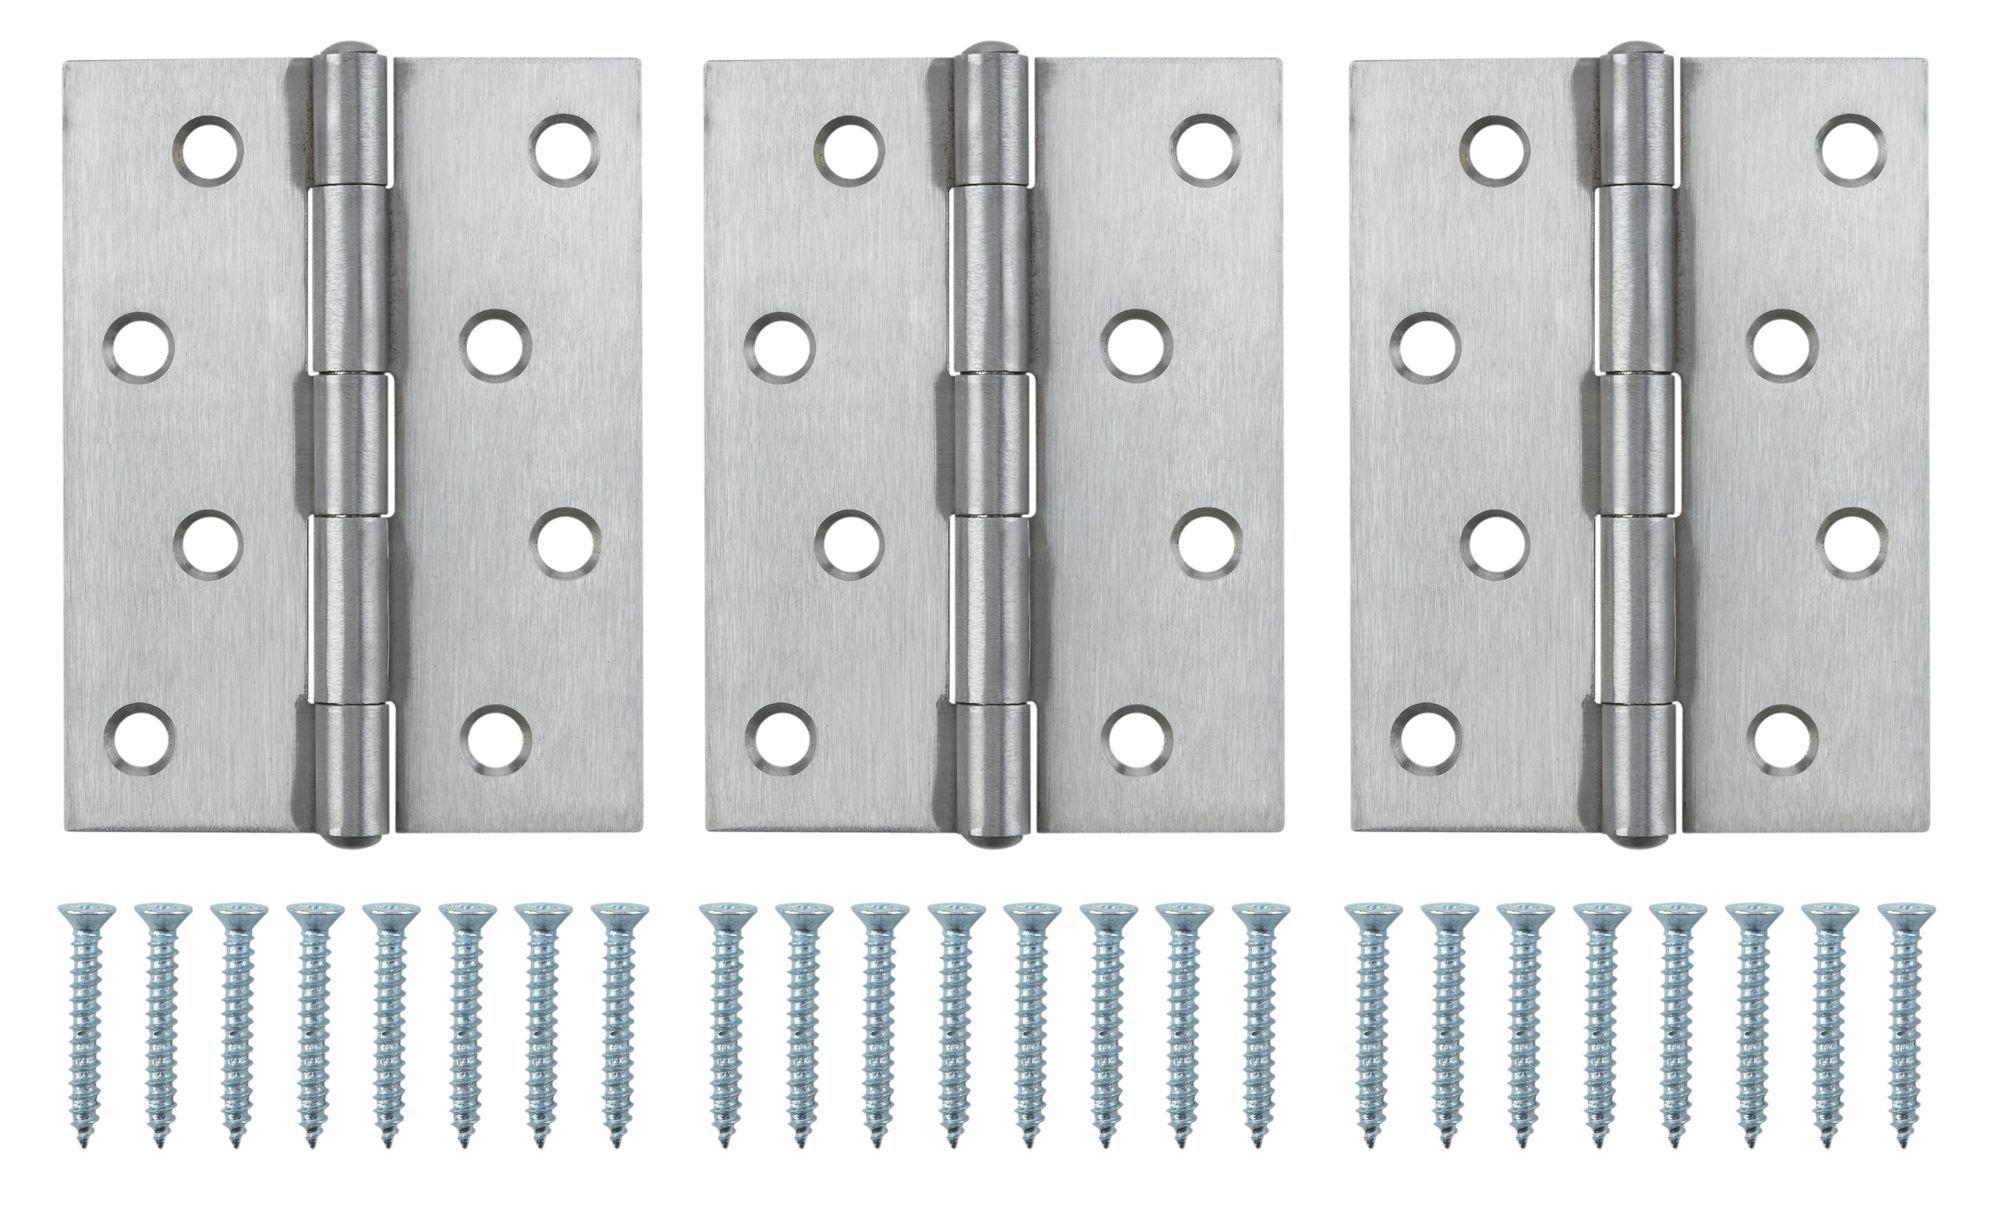 Stainless Steel Butt Hinge, Pack Of 3